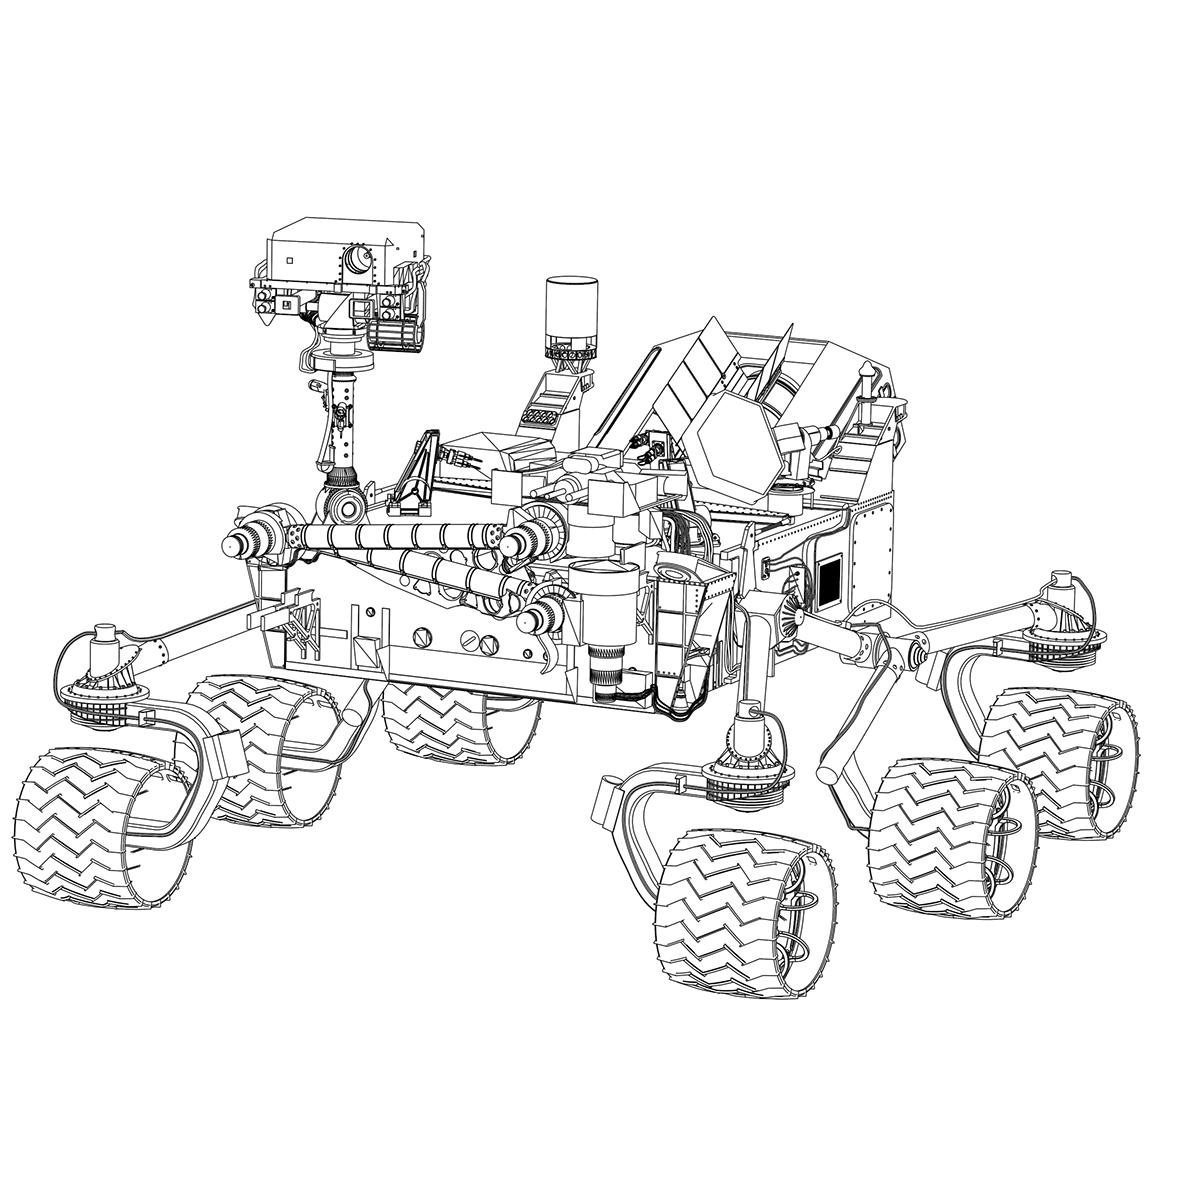 Mars Science Laboratory Rover On Behance